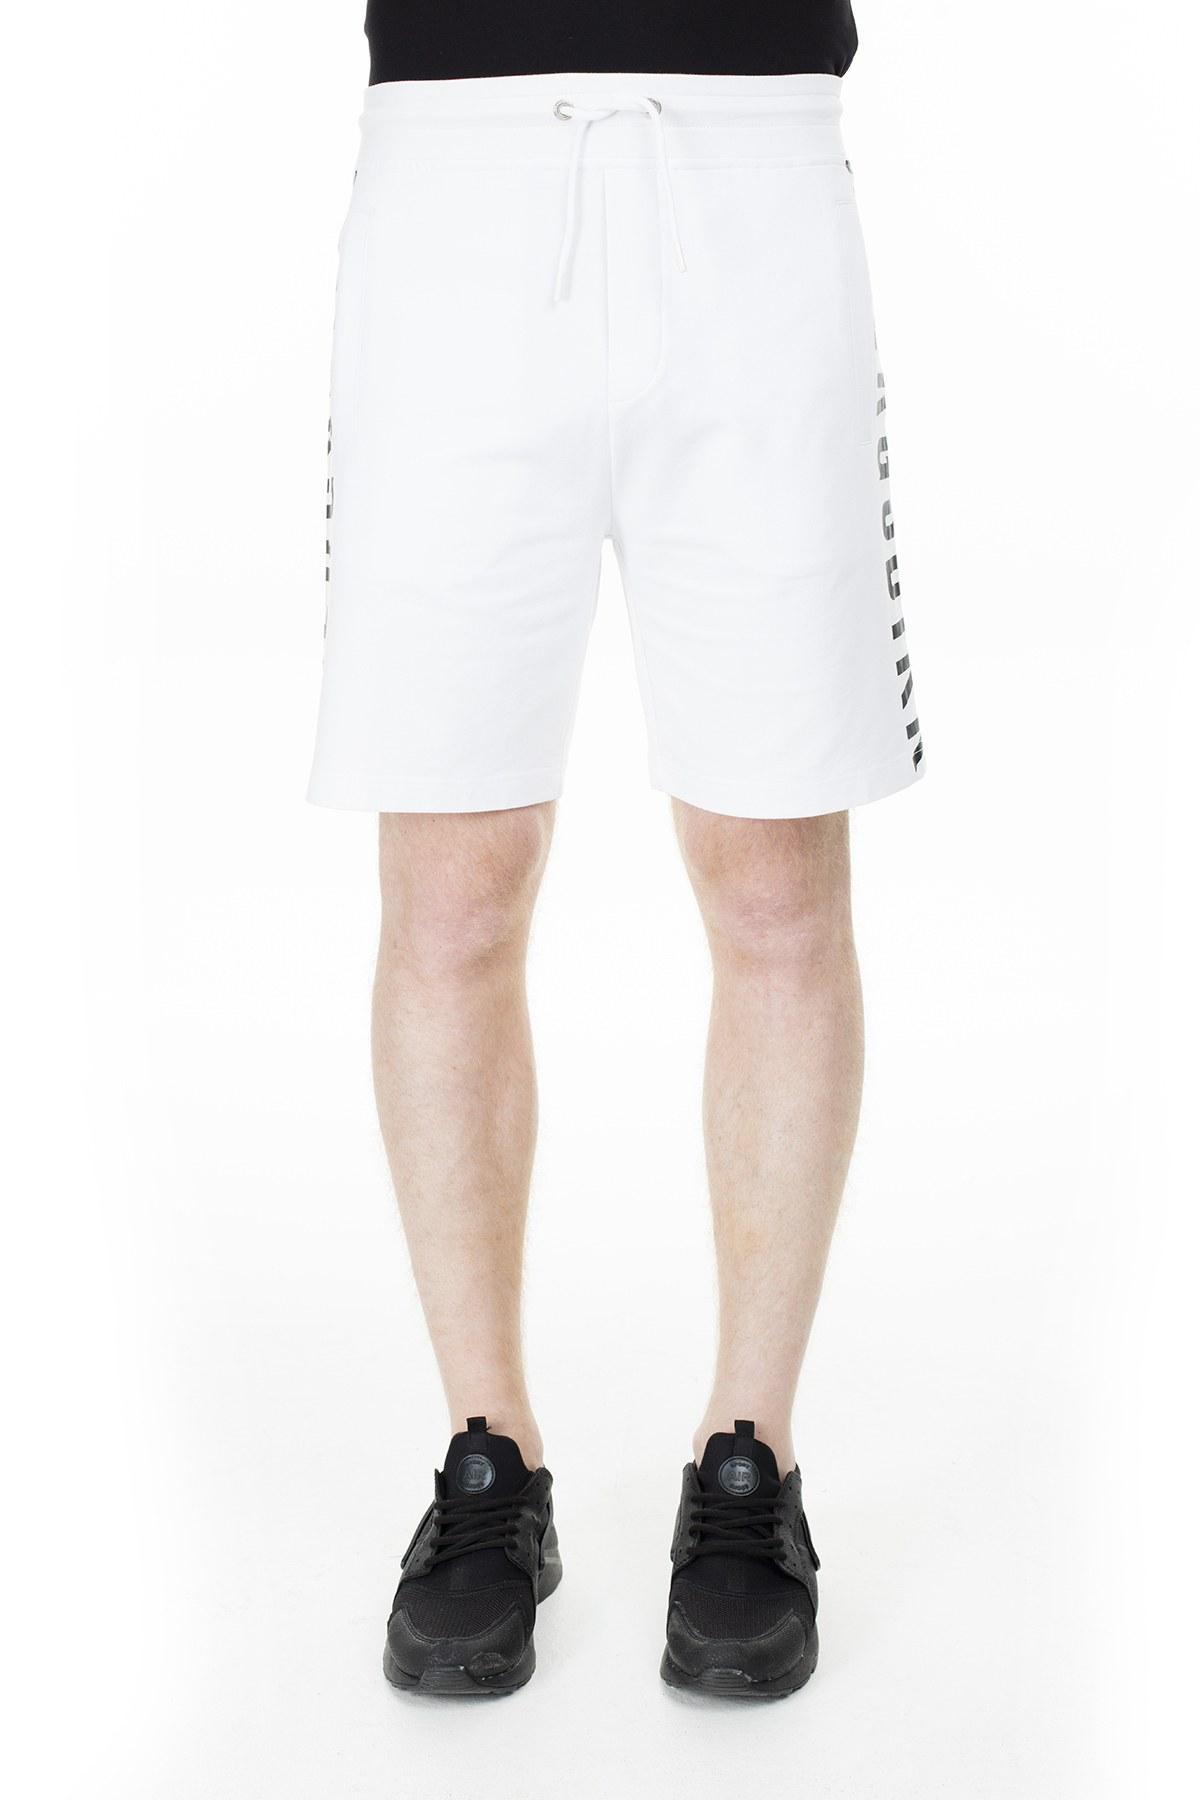 Bikkembergs Erkek Short C101801E1551A00 BEYAZ